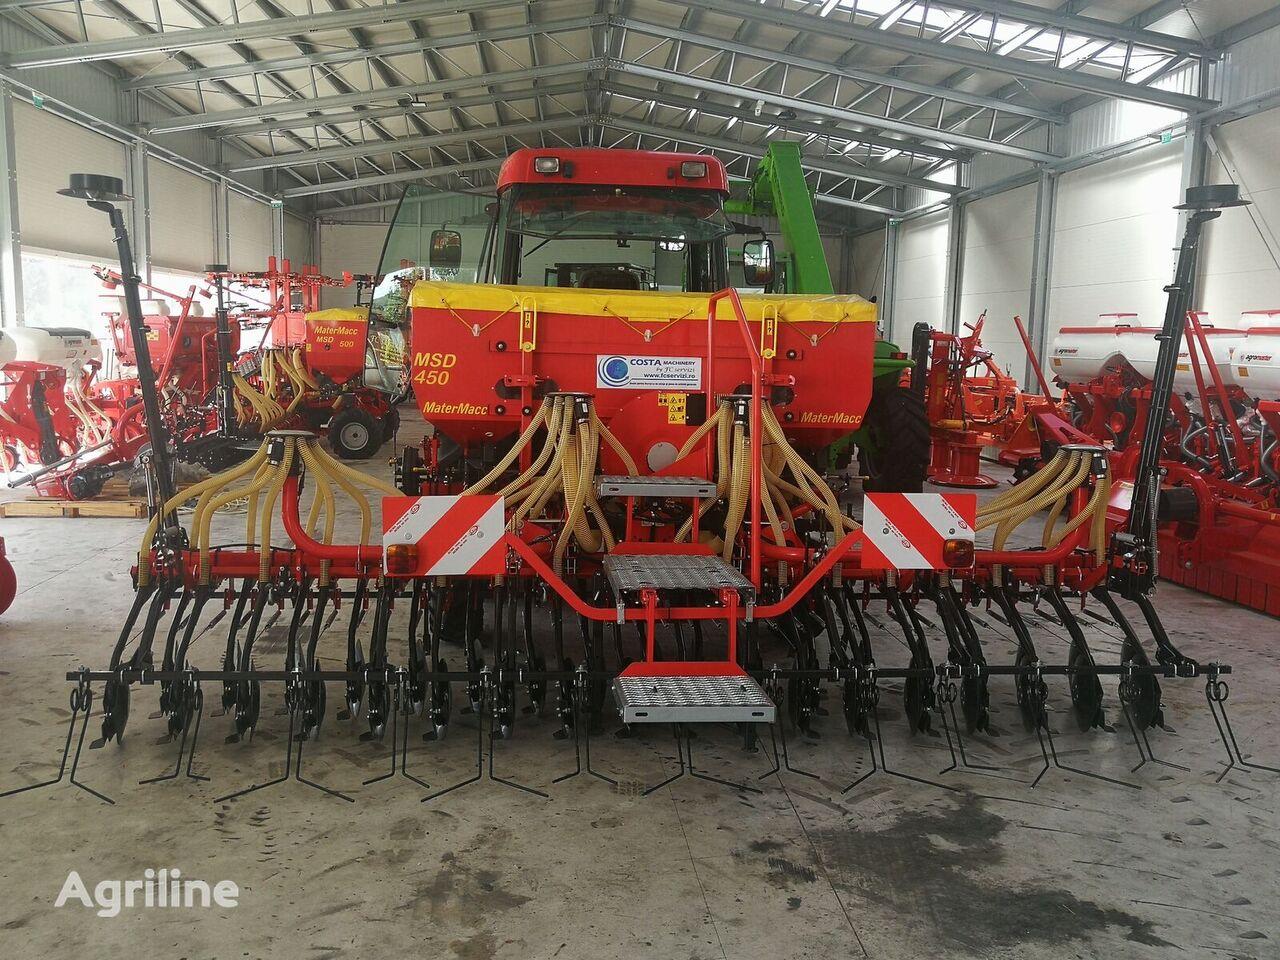 MATERMACC SEEDER MSD 450 sembradora neumática nueva